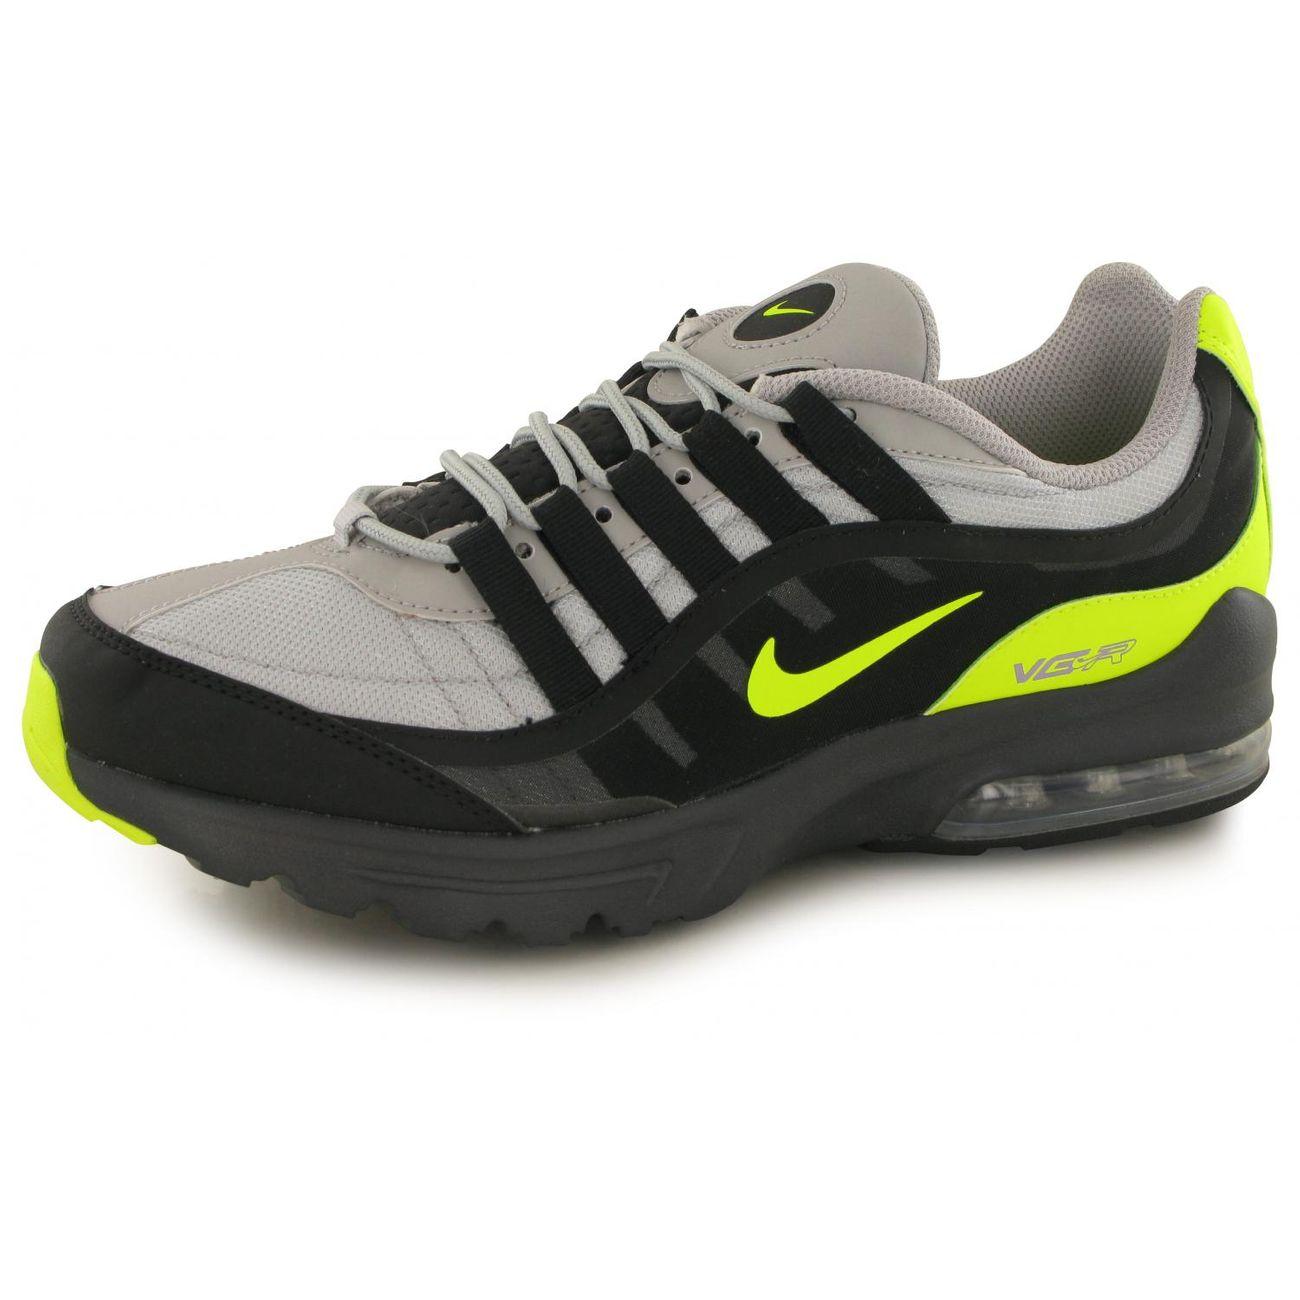 Mode- Lifestyle homme NIKE Nike Air Max Vgr